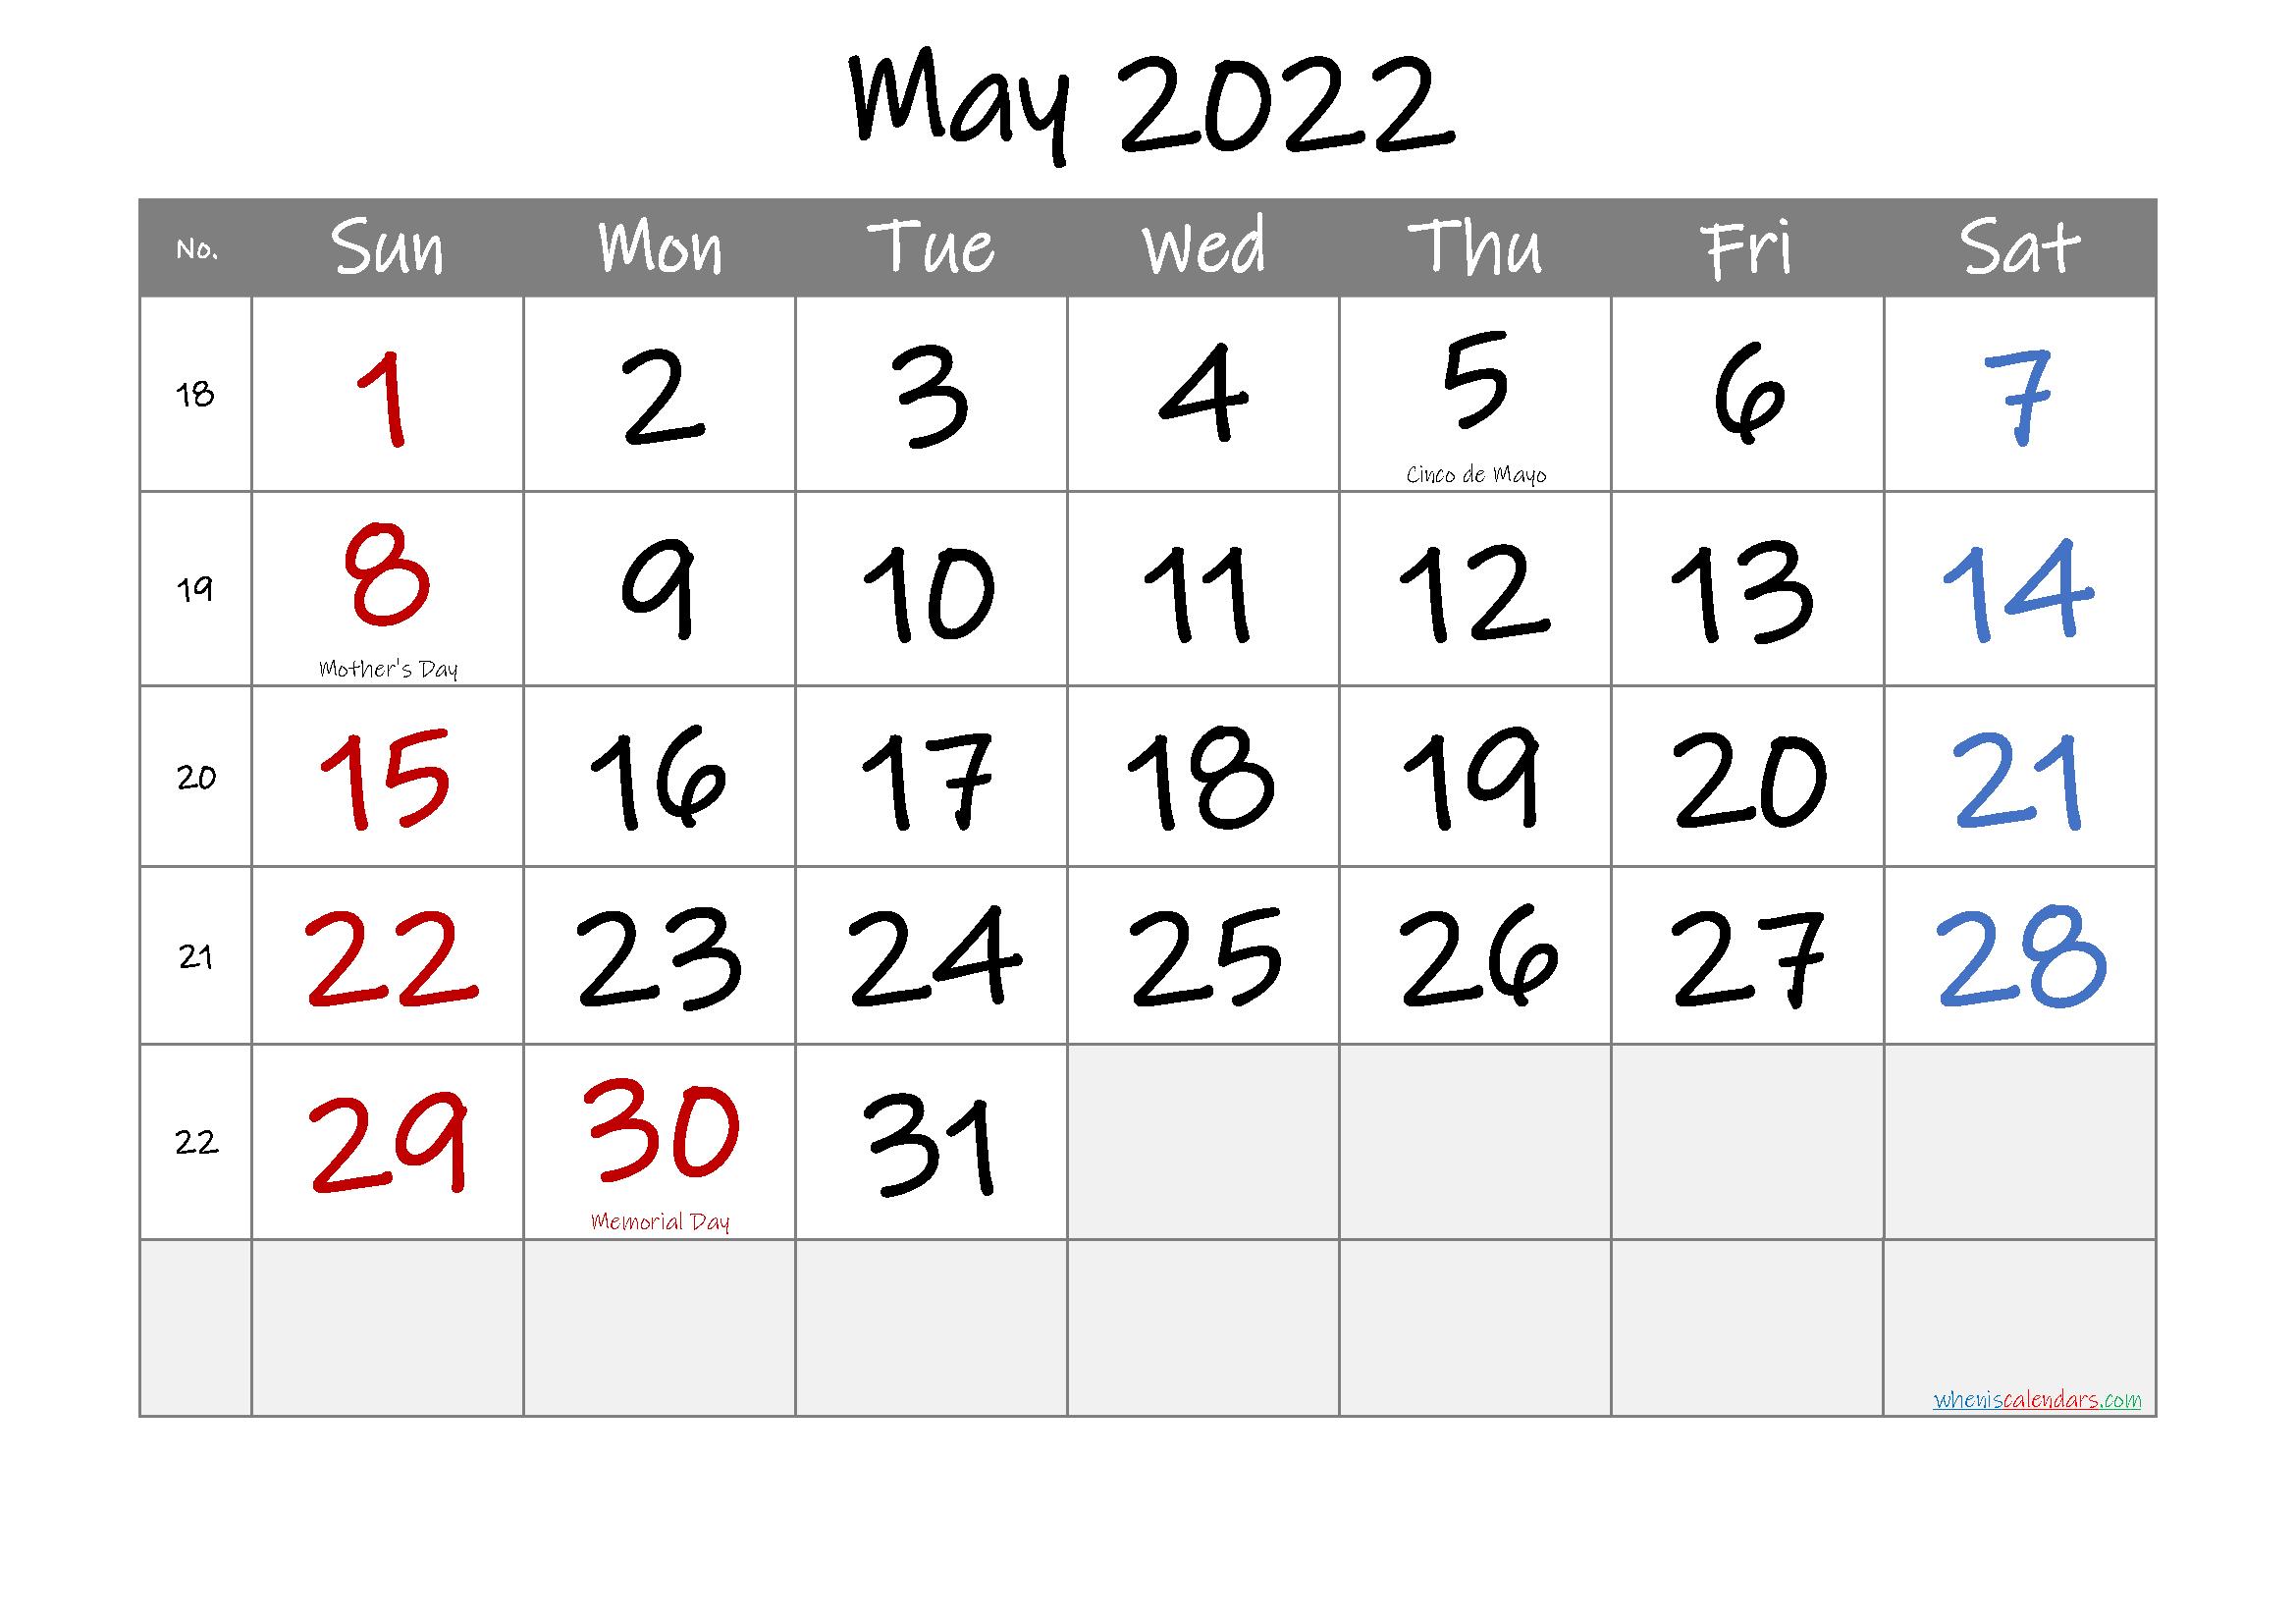 May 2022 Free Printable Calendar Template No.if22M29 – Free Free Printable Calendars 8 Week